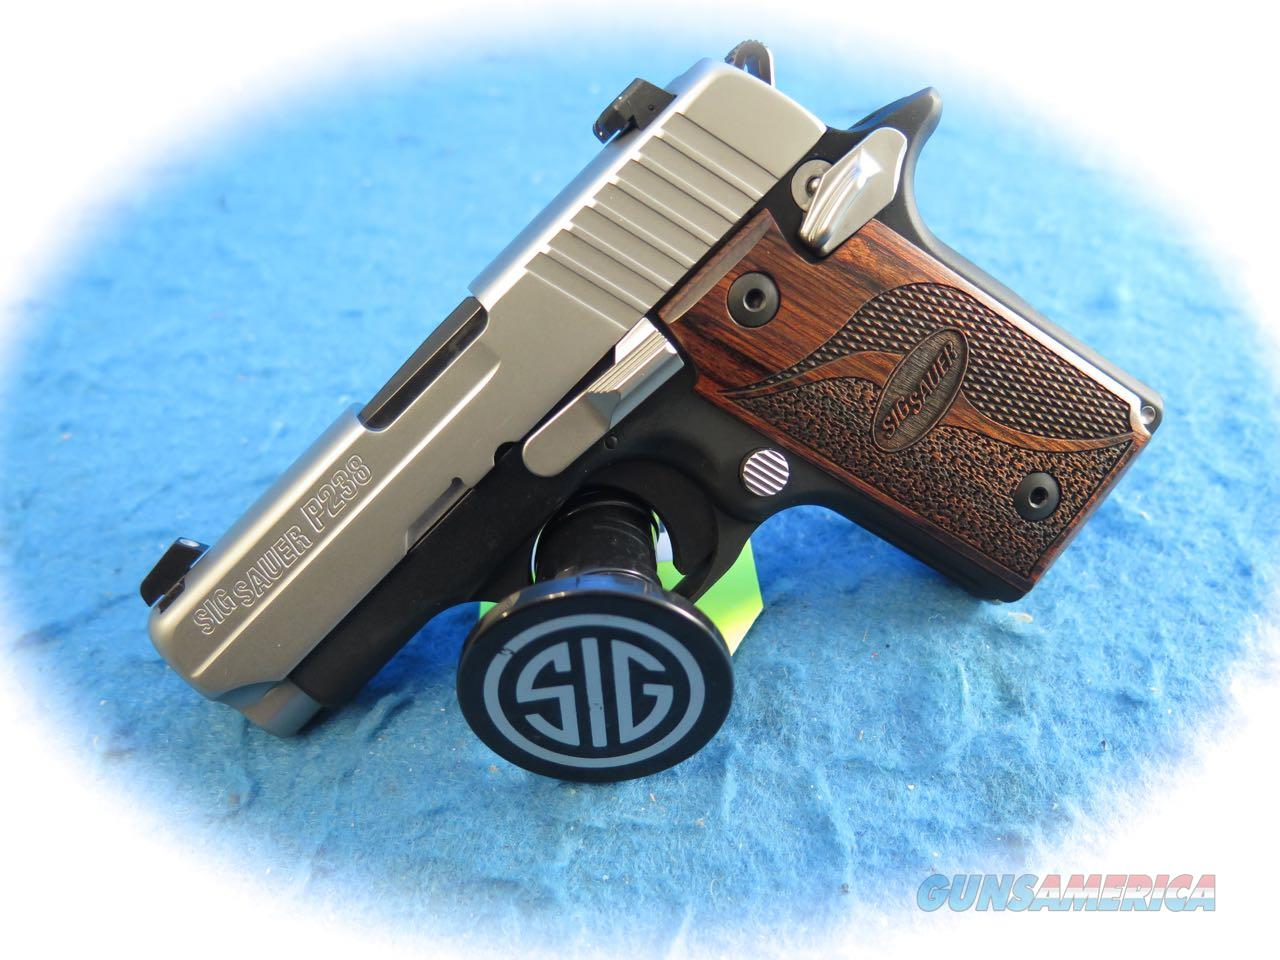 Handgun grips for 1911, p238 sas, and Bodyguard 380